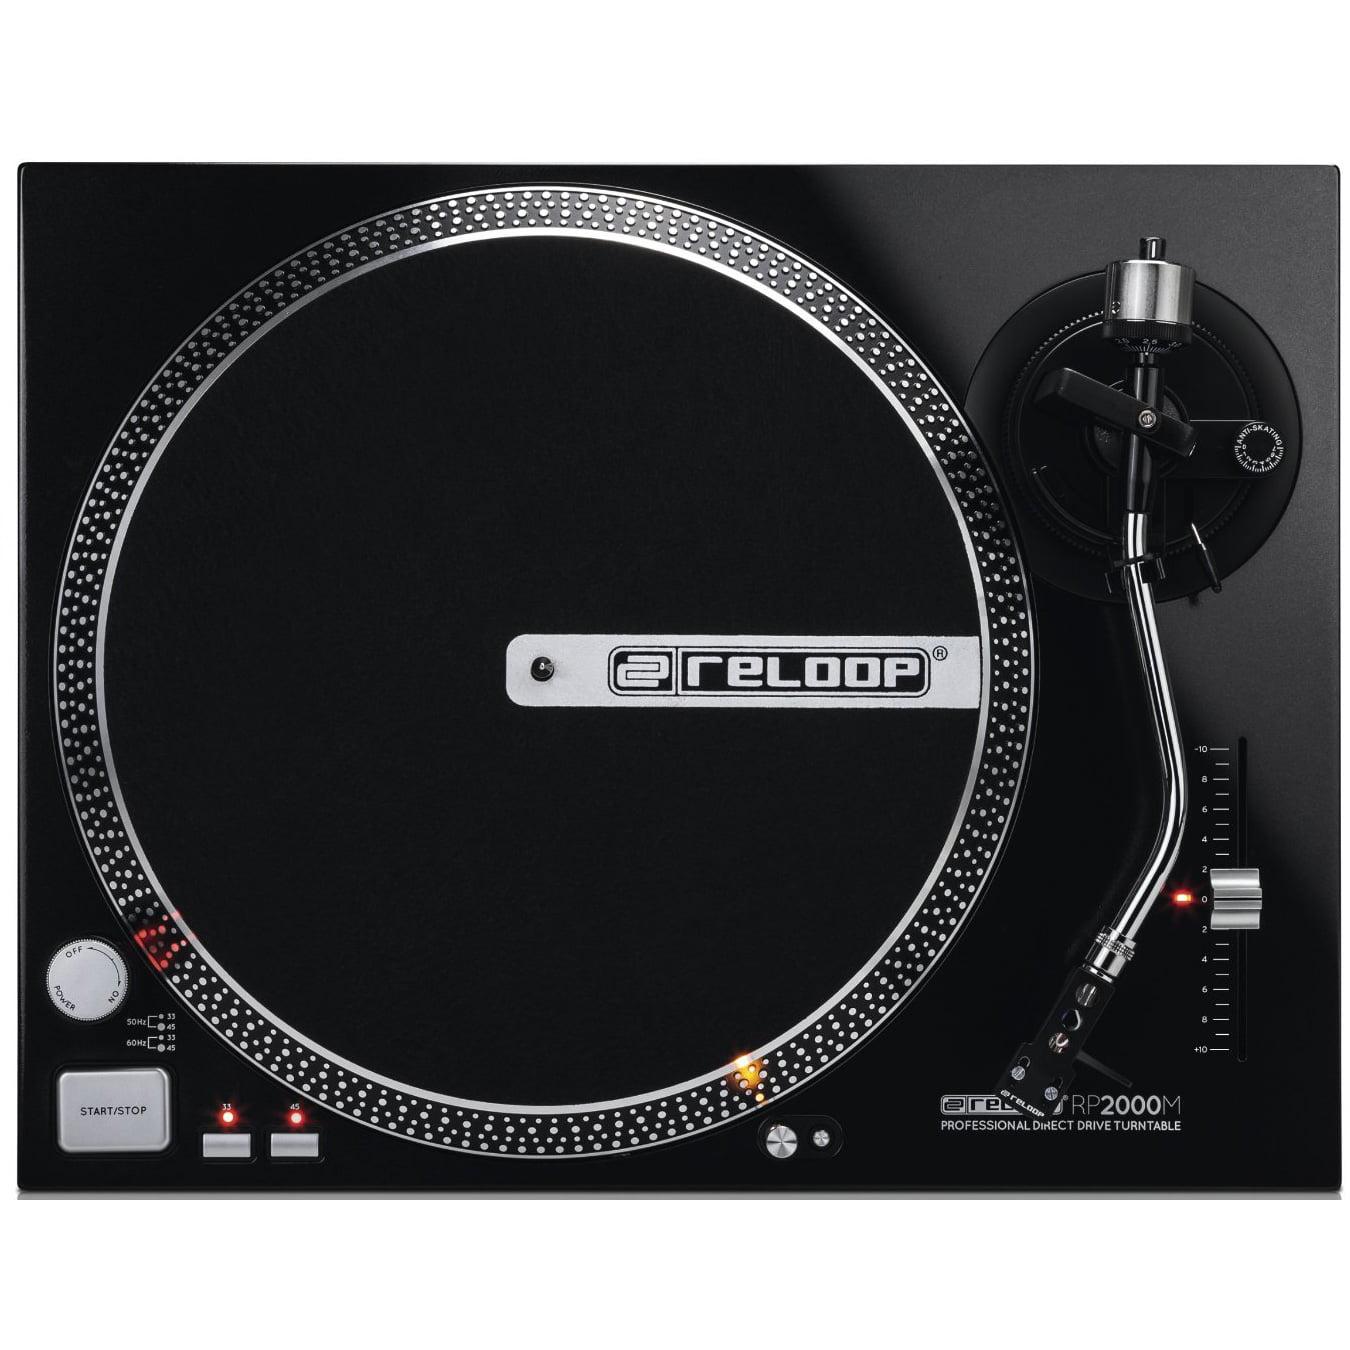 Reloop RP-2000-M DJ Turntable with Quartz Driven Direct Drive, Metallic Black by Reloop